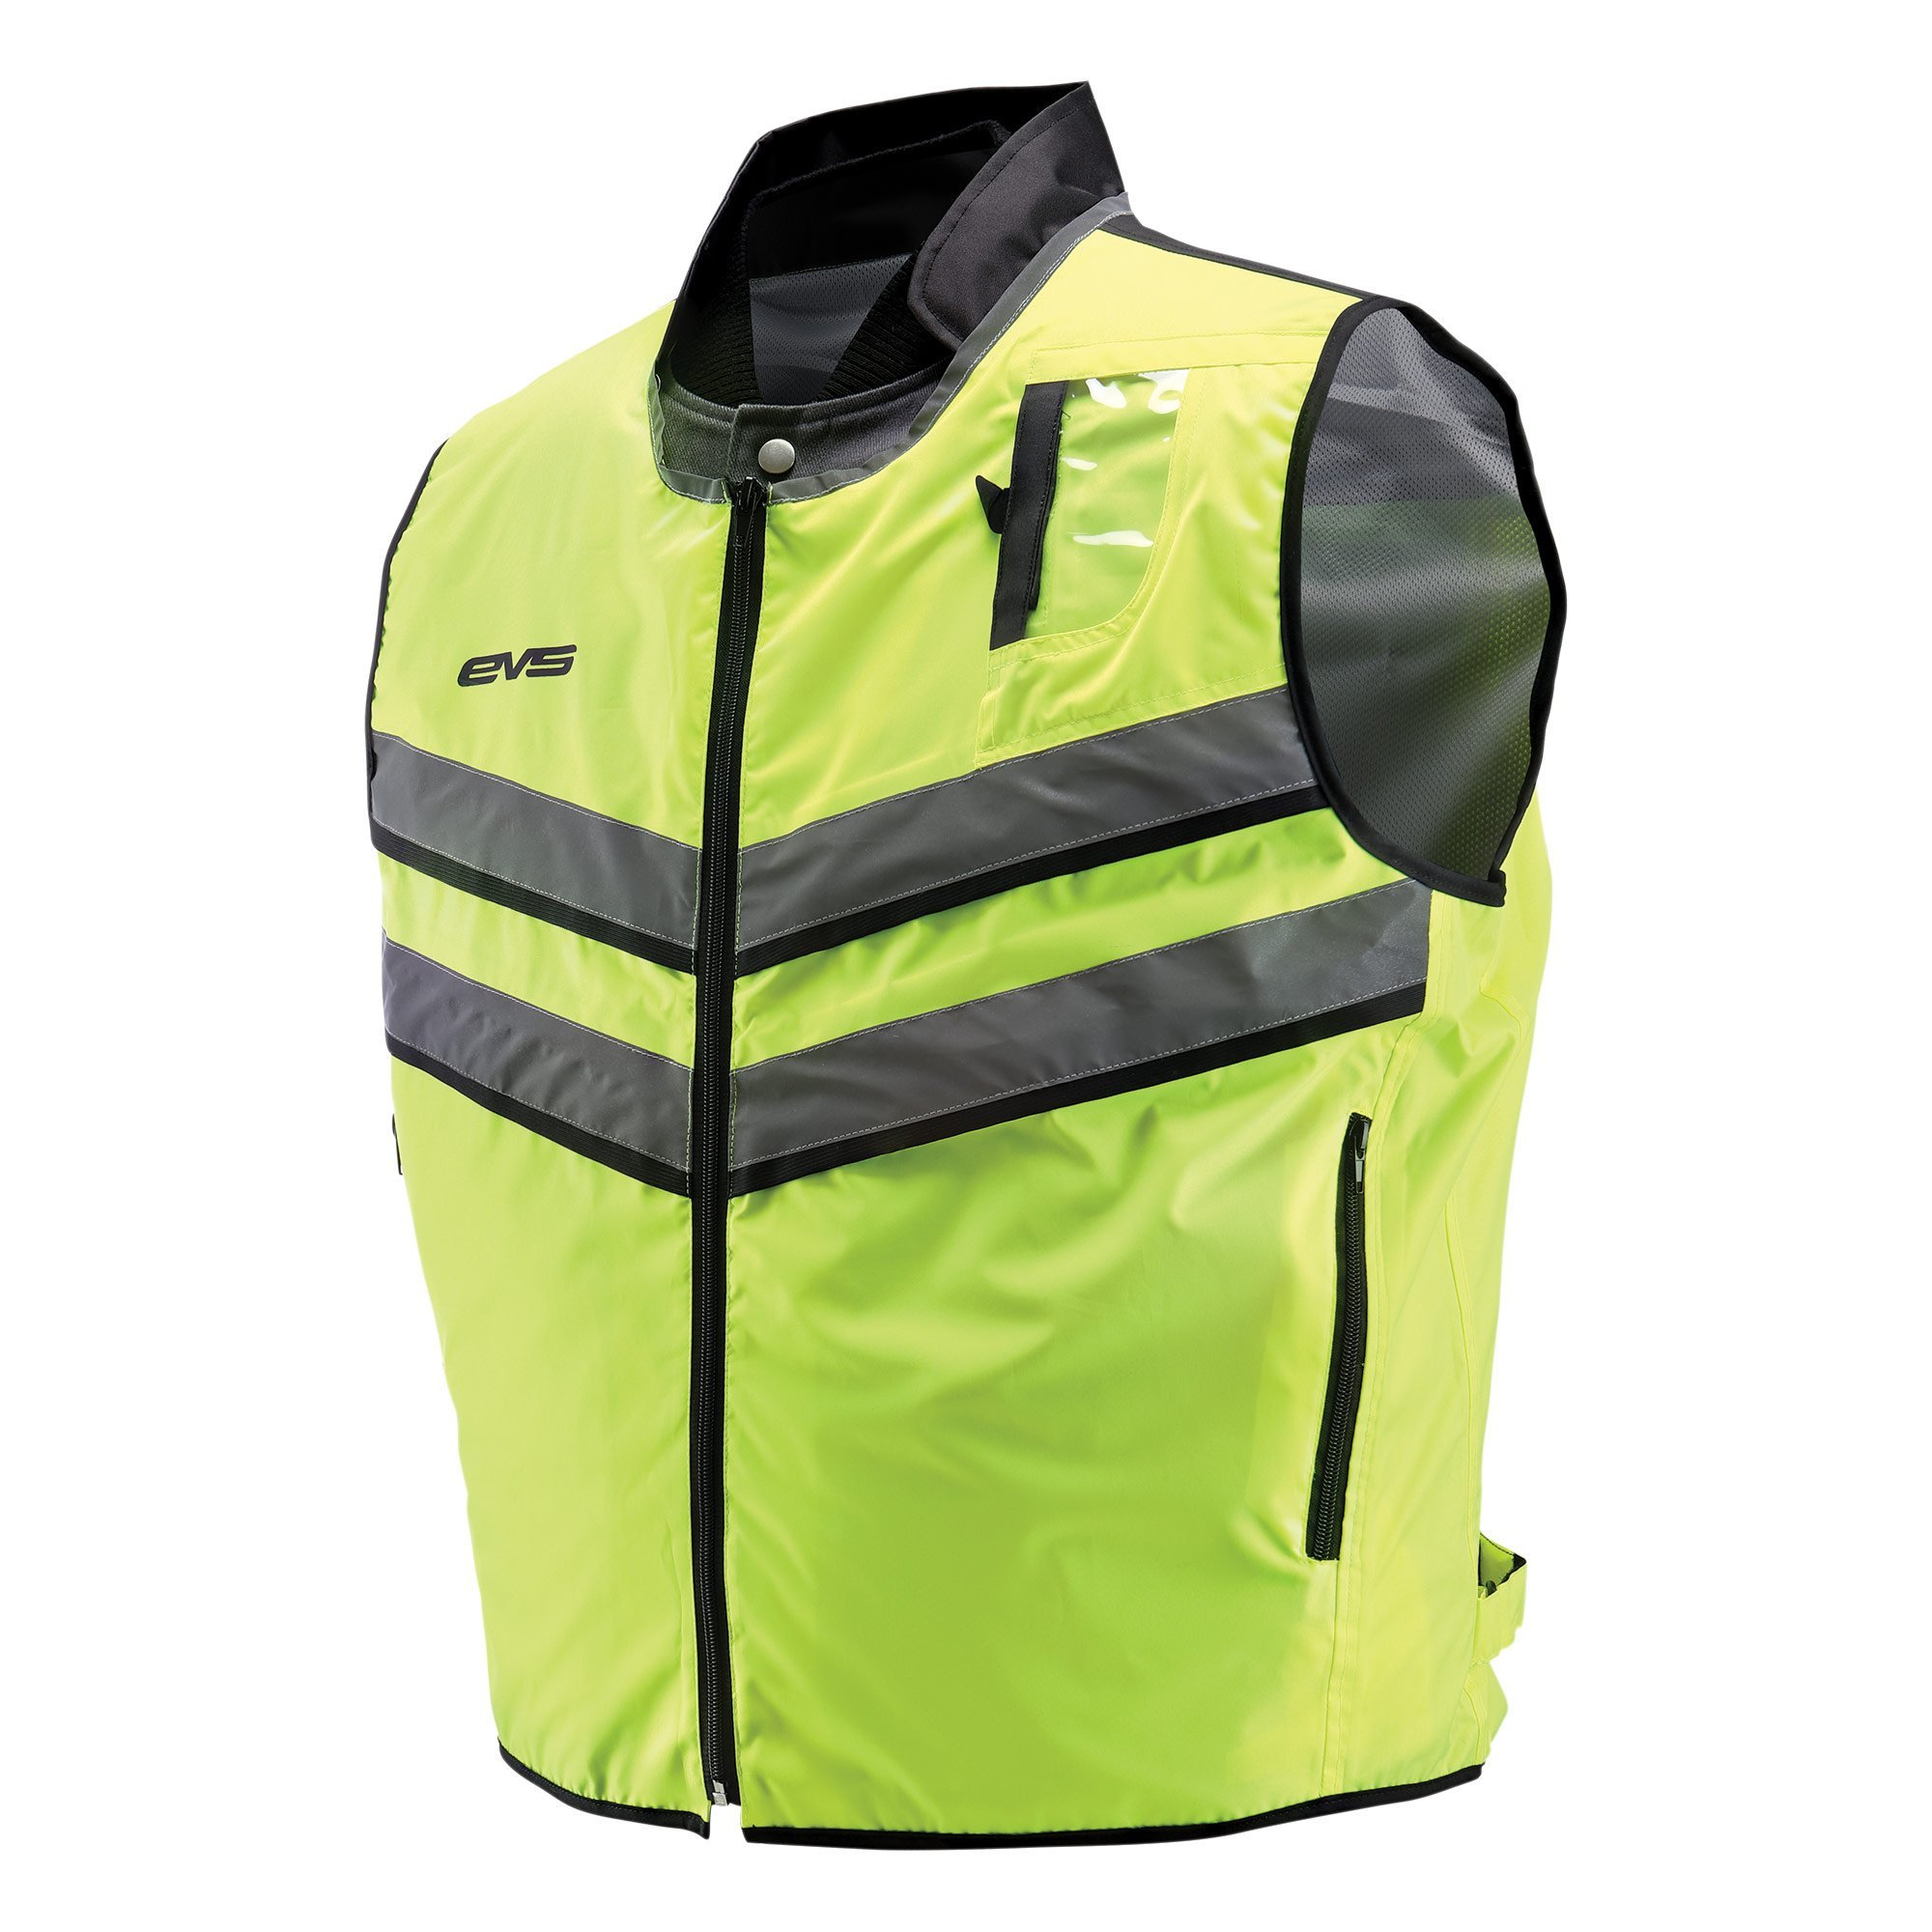 EVS Sports Unisex-Adult's Street Touring Vest (Hi-Viz, XX-Large)